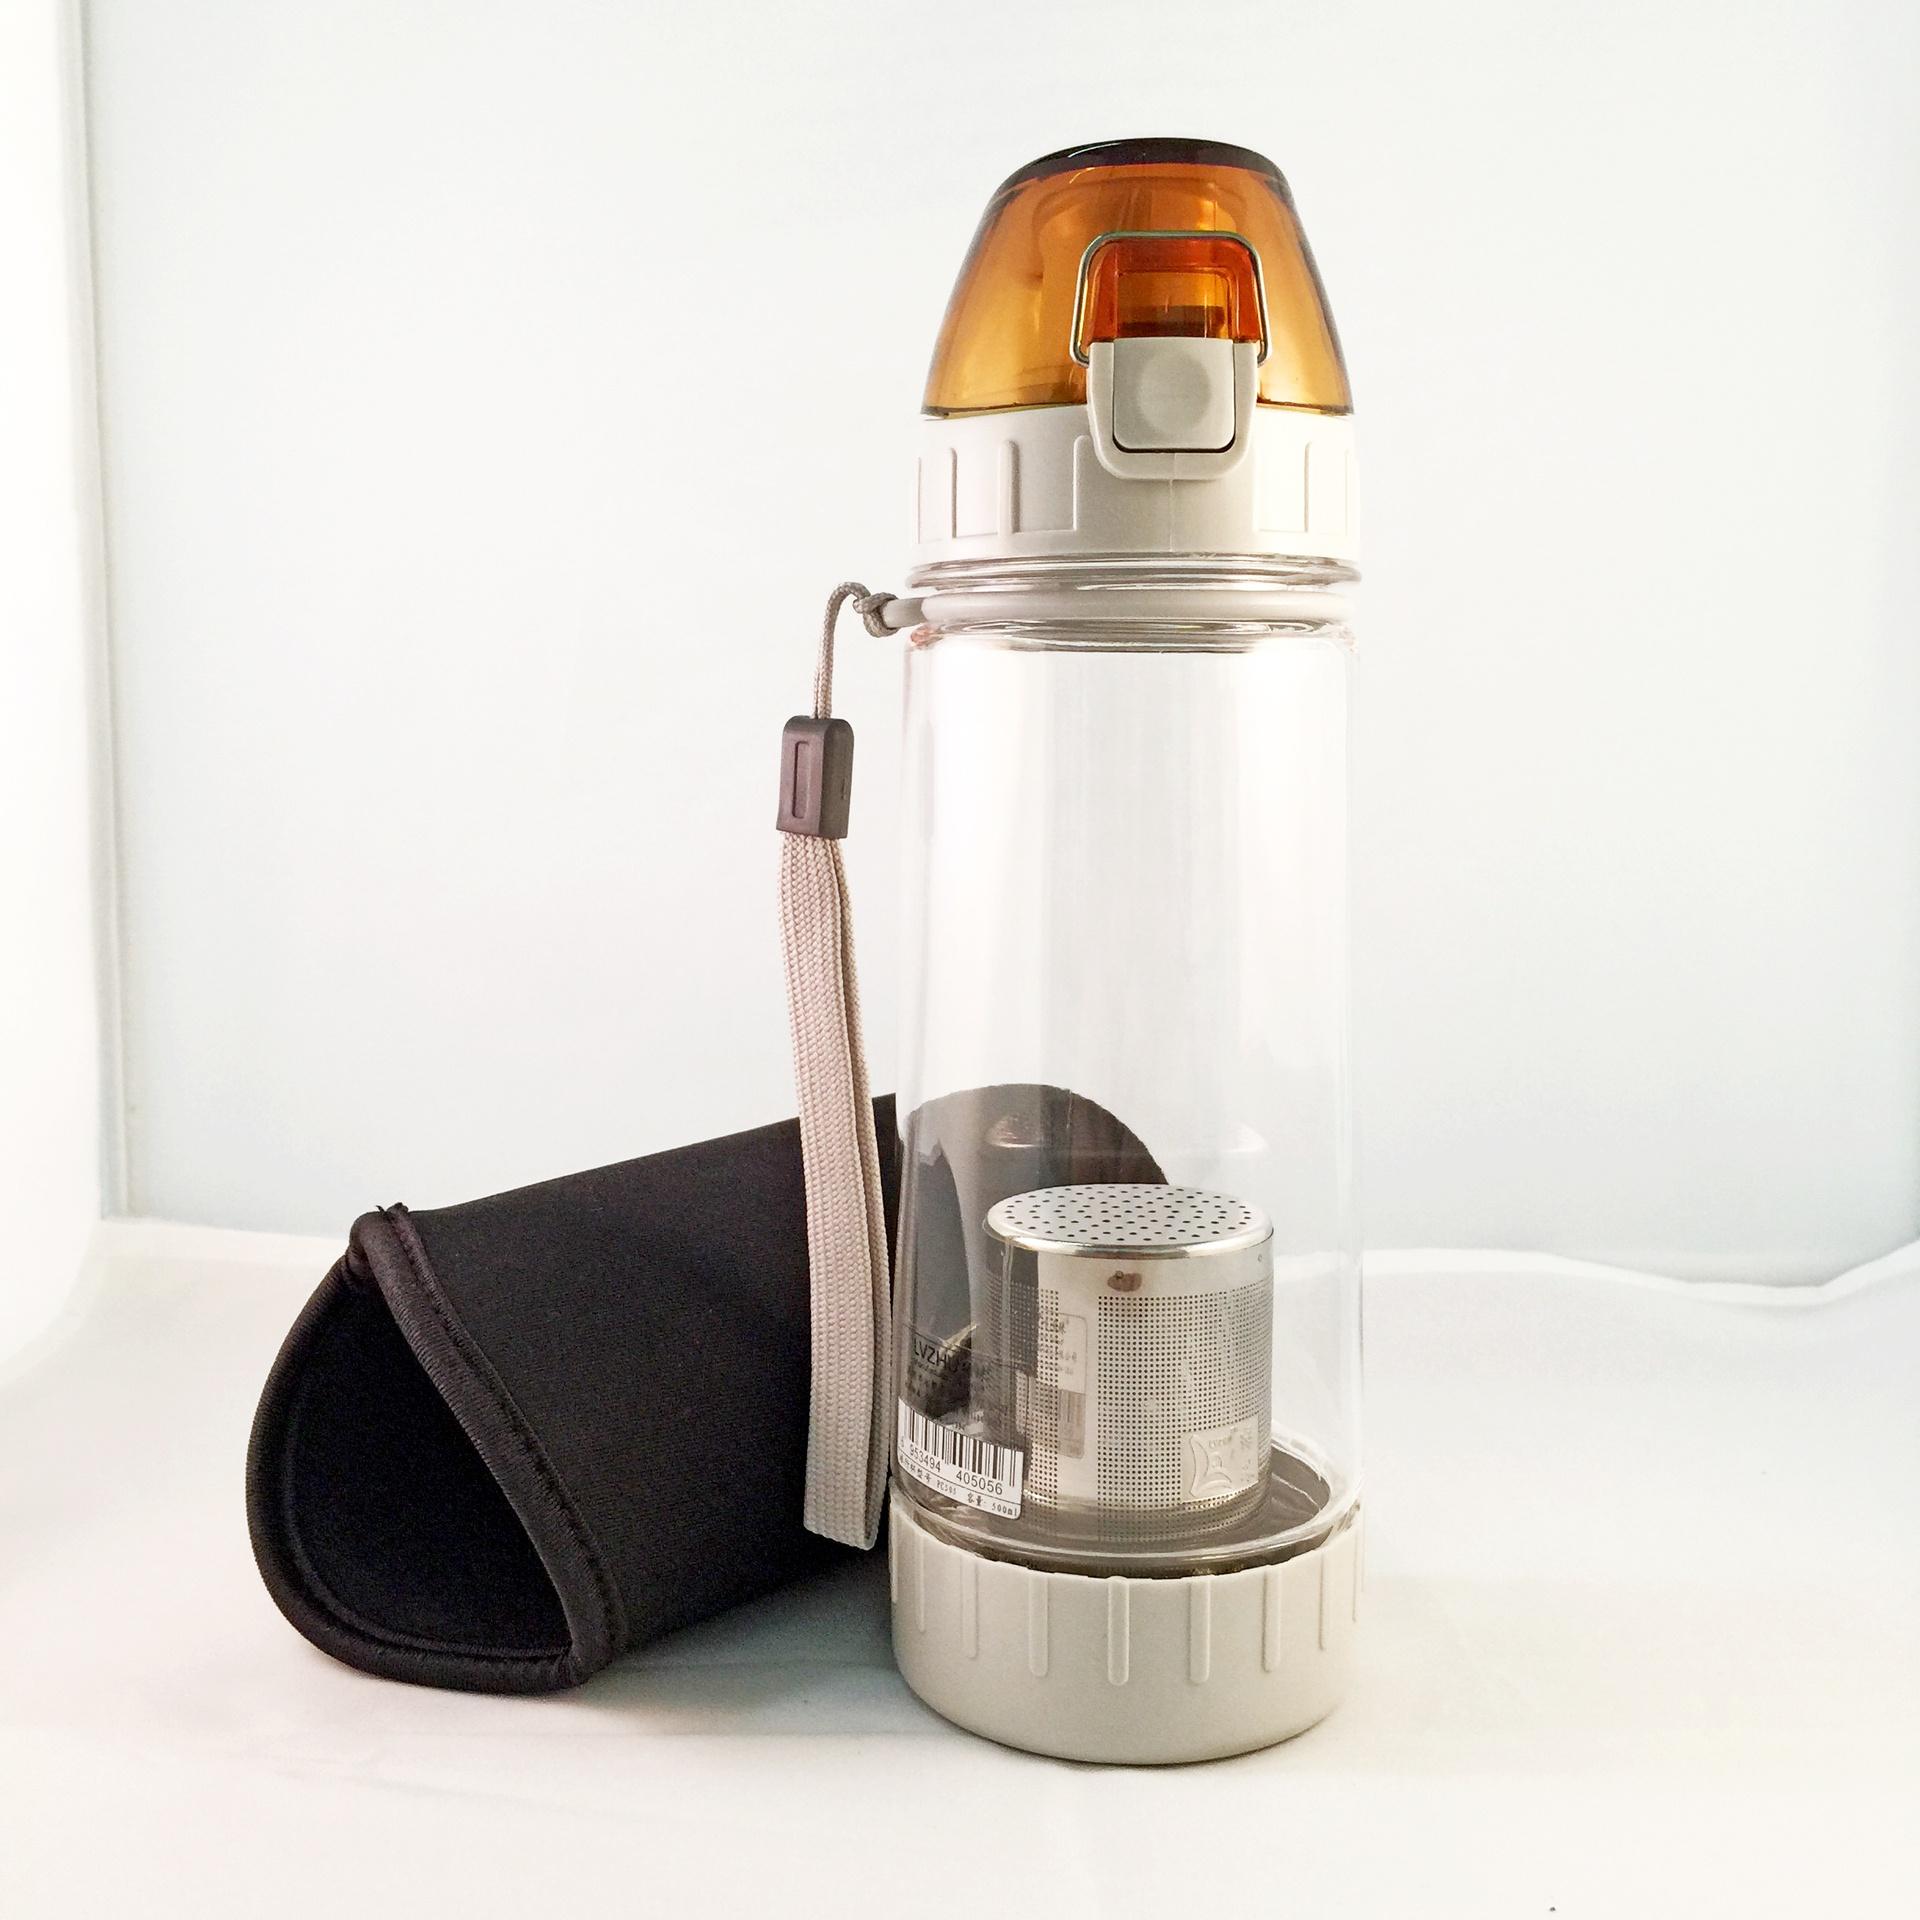 LVZHU Travel Tea Mug With Sleeve & LVZHU Travel Tea Mug With Sleeve | Portable Mugs | M\u0027s Home and ...